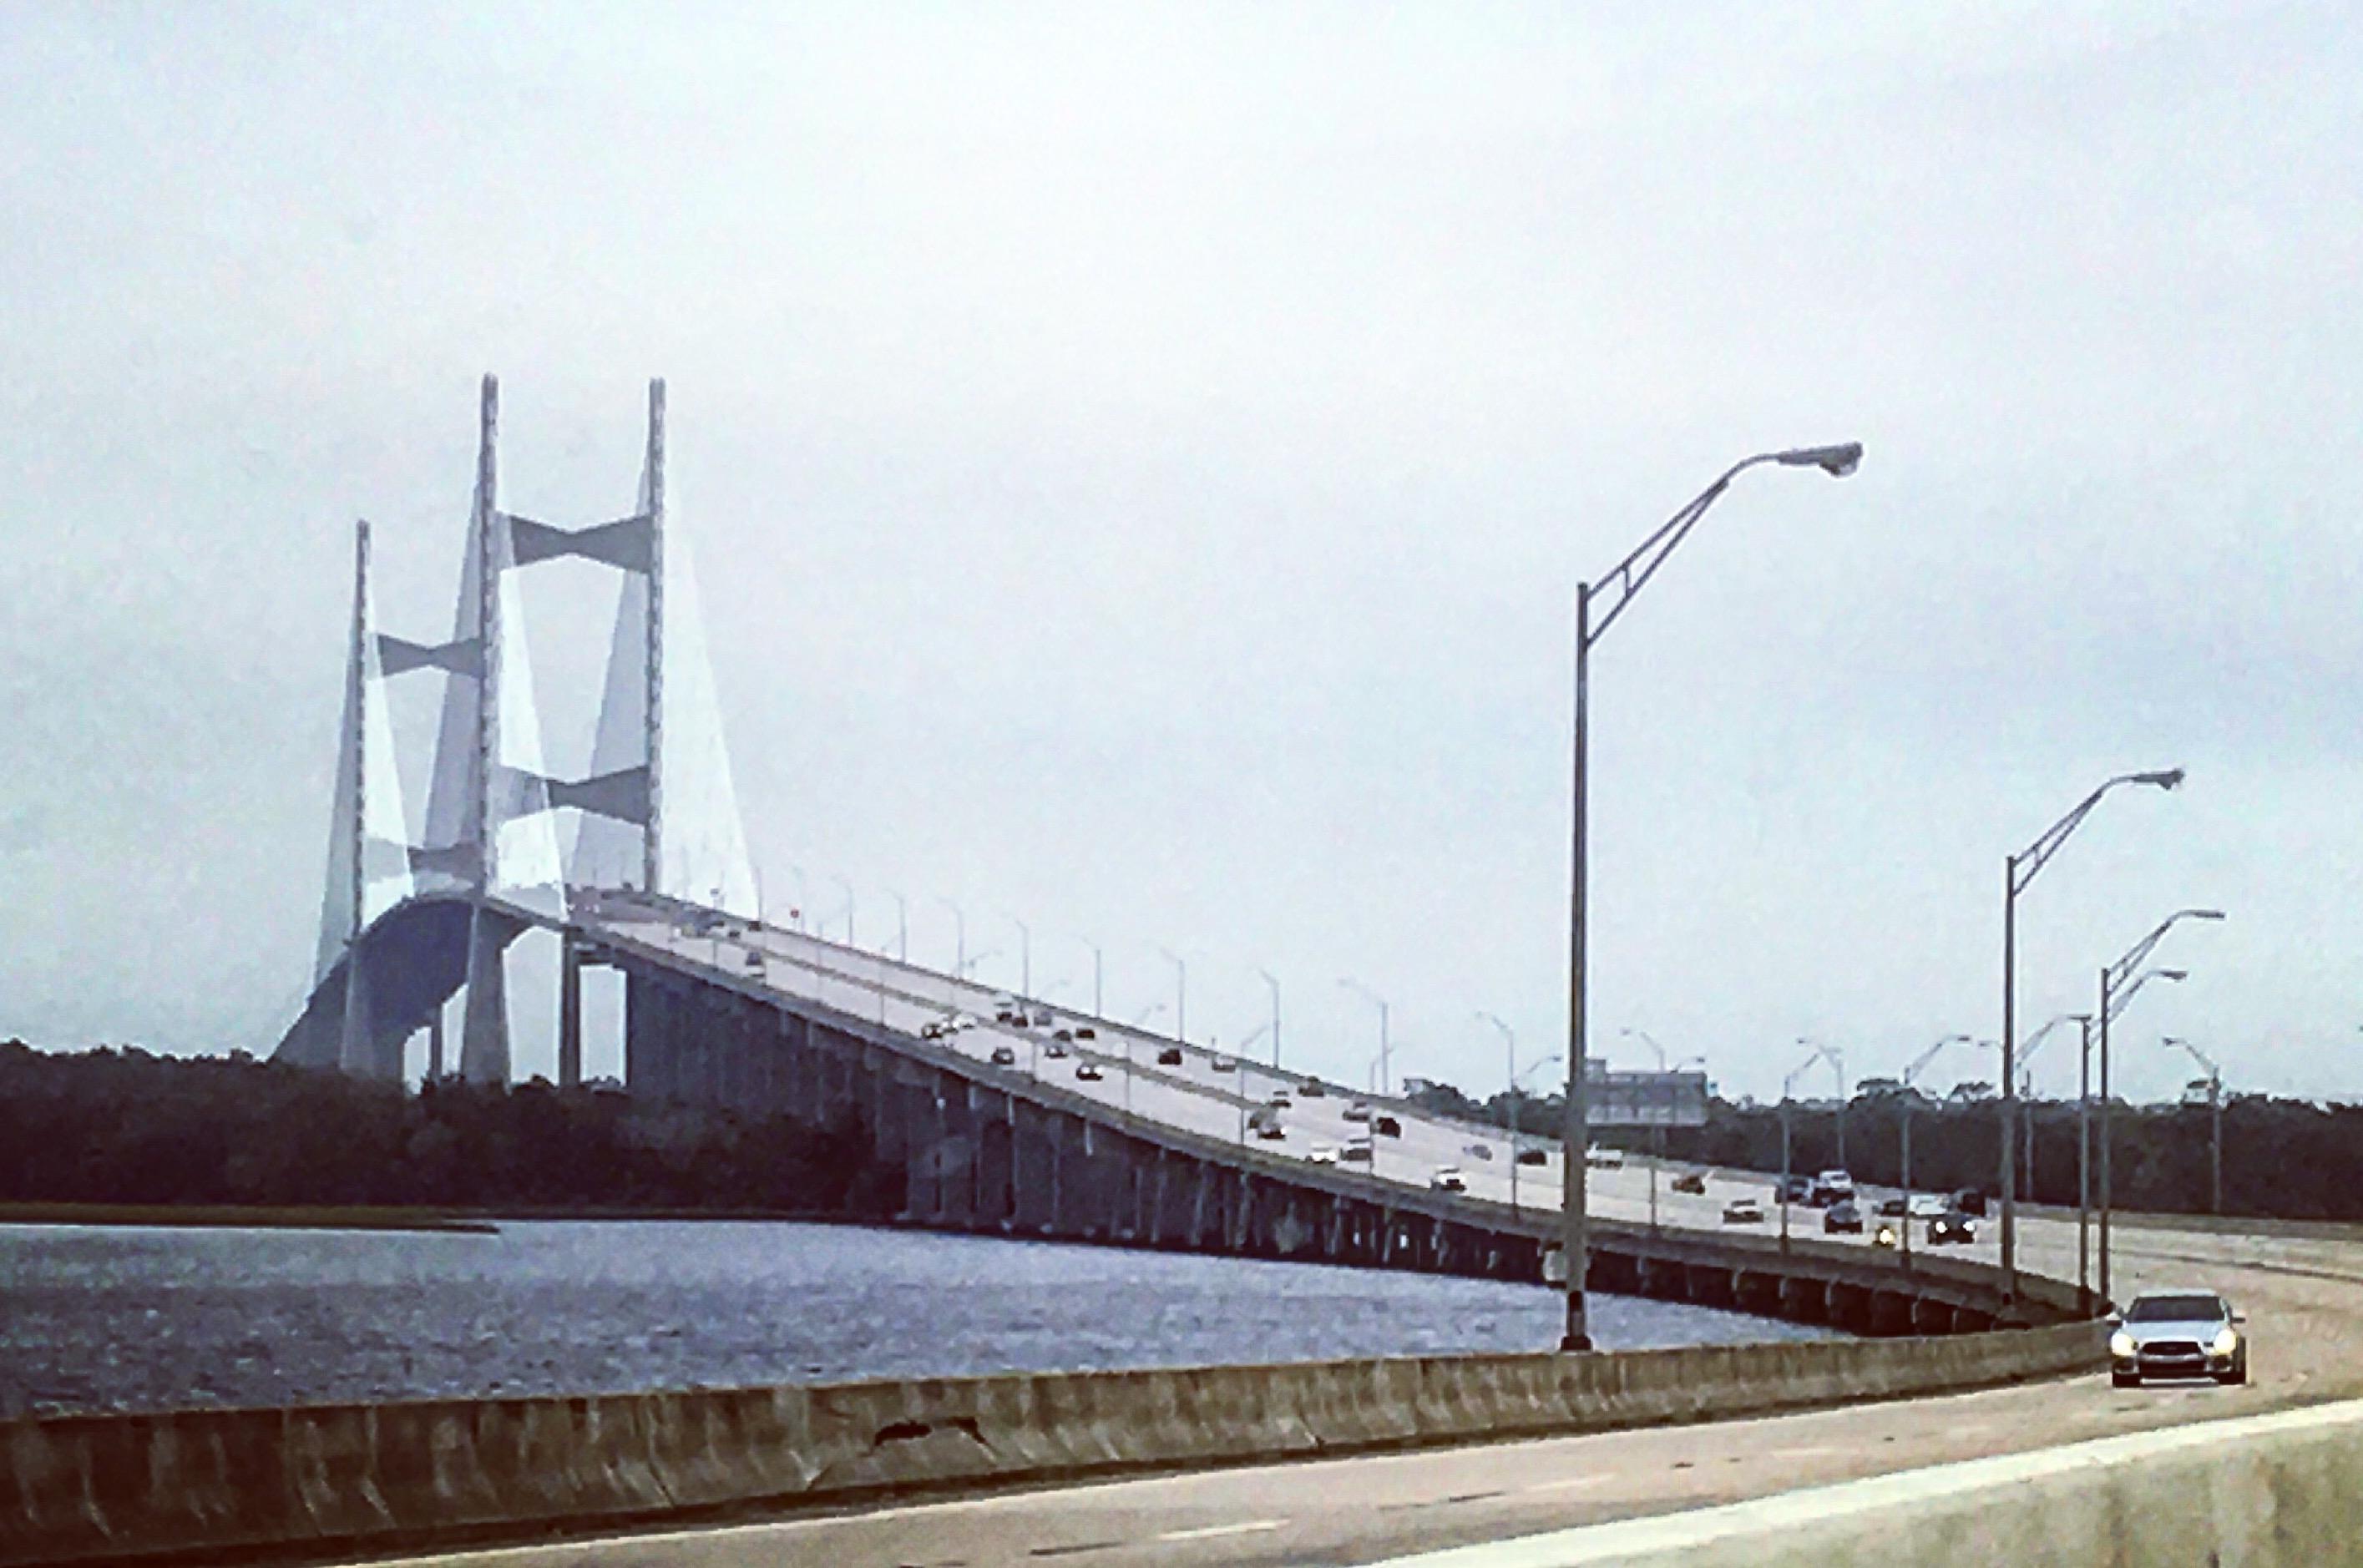 Dames Point Bridge in jacksonville, FL